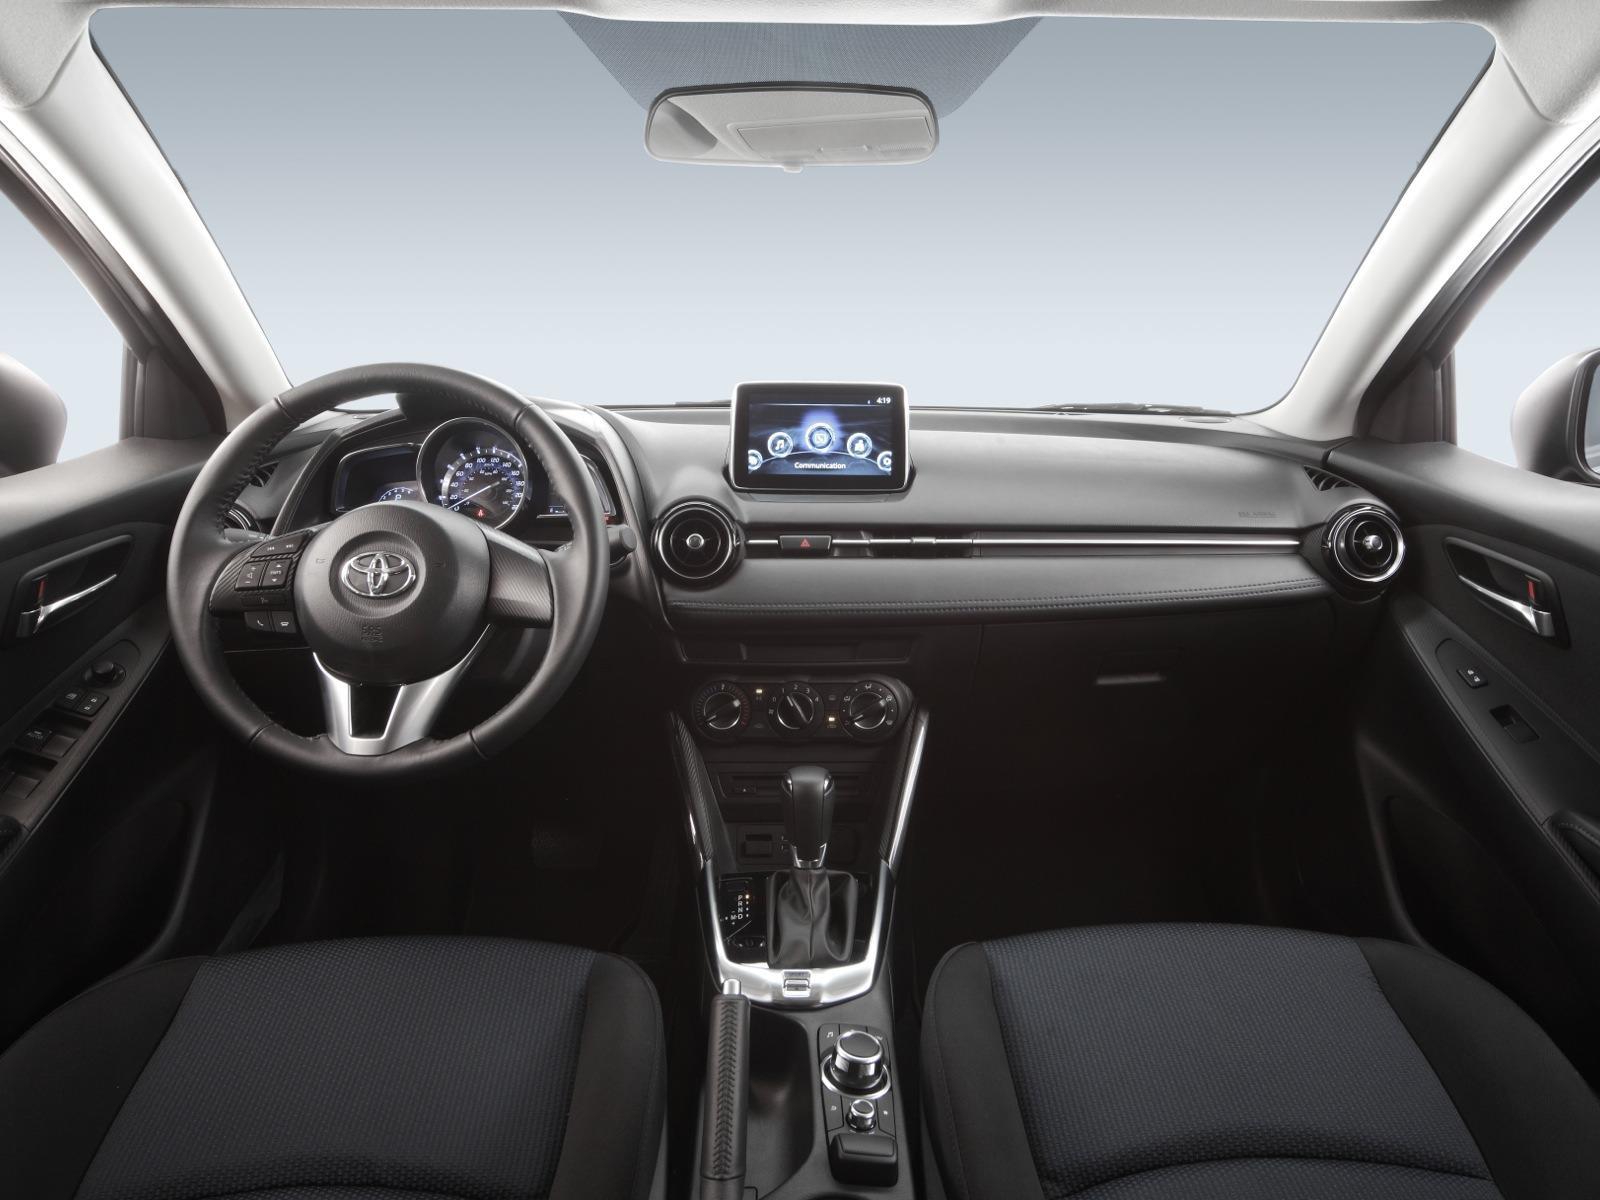 Toyota Yaris R 2016 - Autocosmos.com